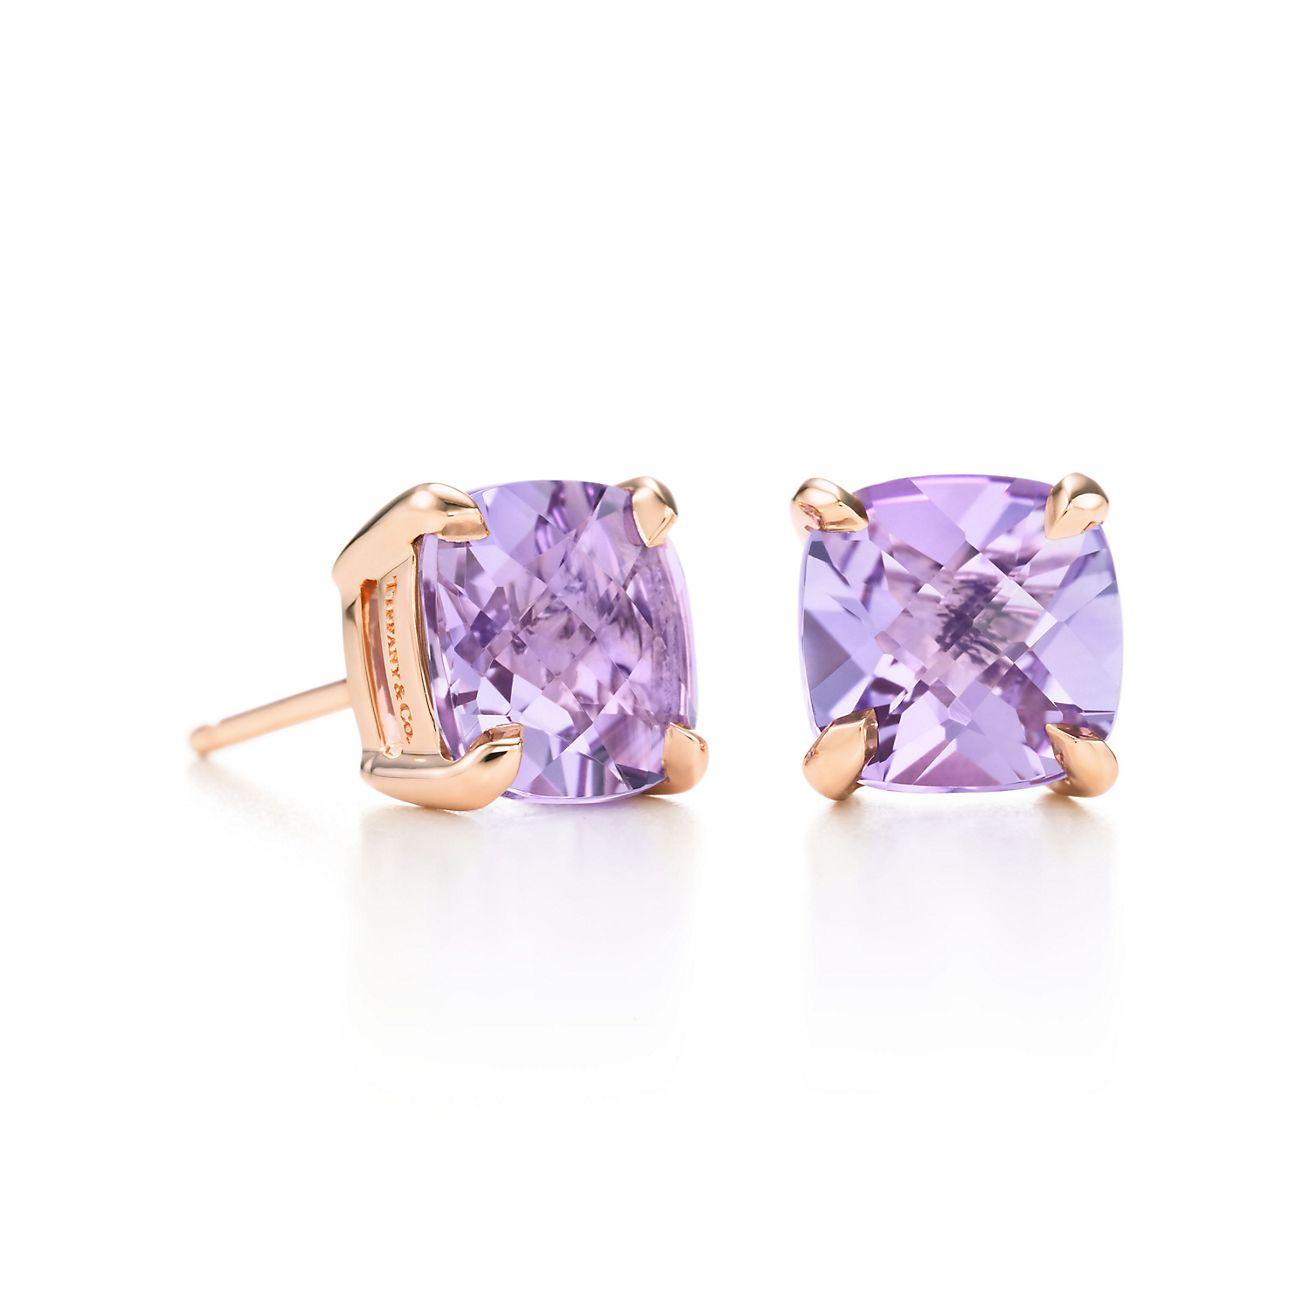 08feecf1b ... tiffany sparklers lavender amethyst earrings in 18k rose gold. tiffany  co. ...